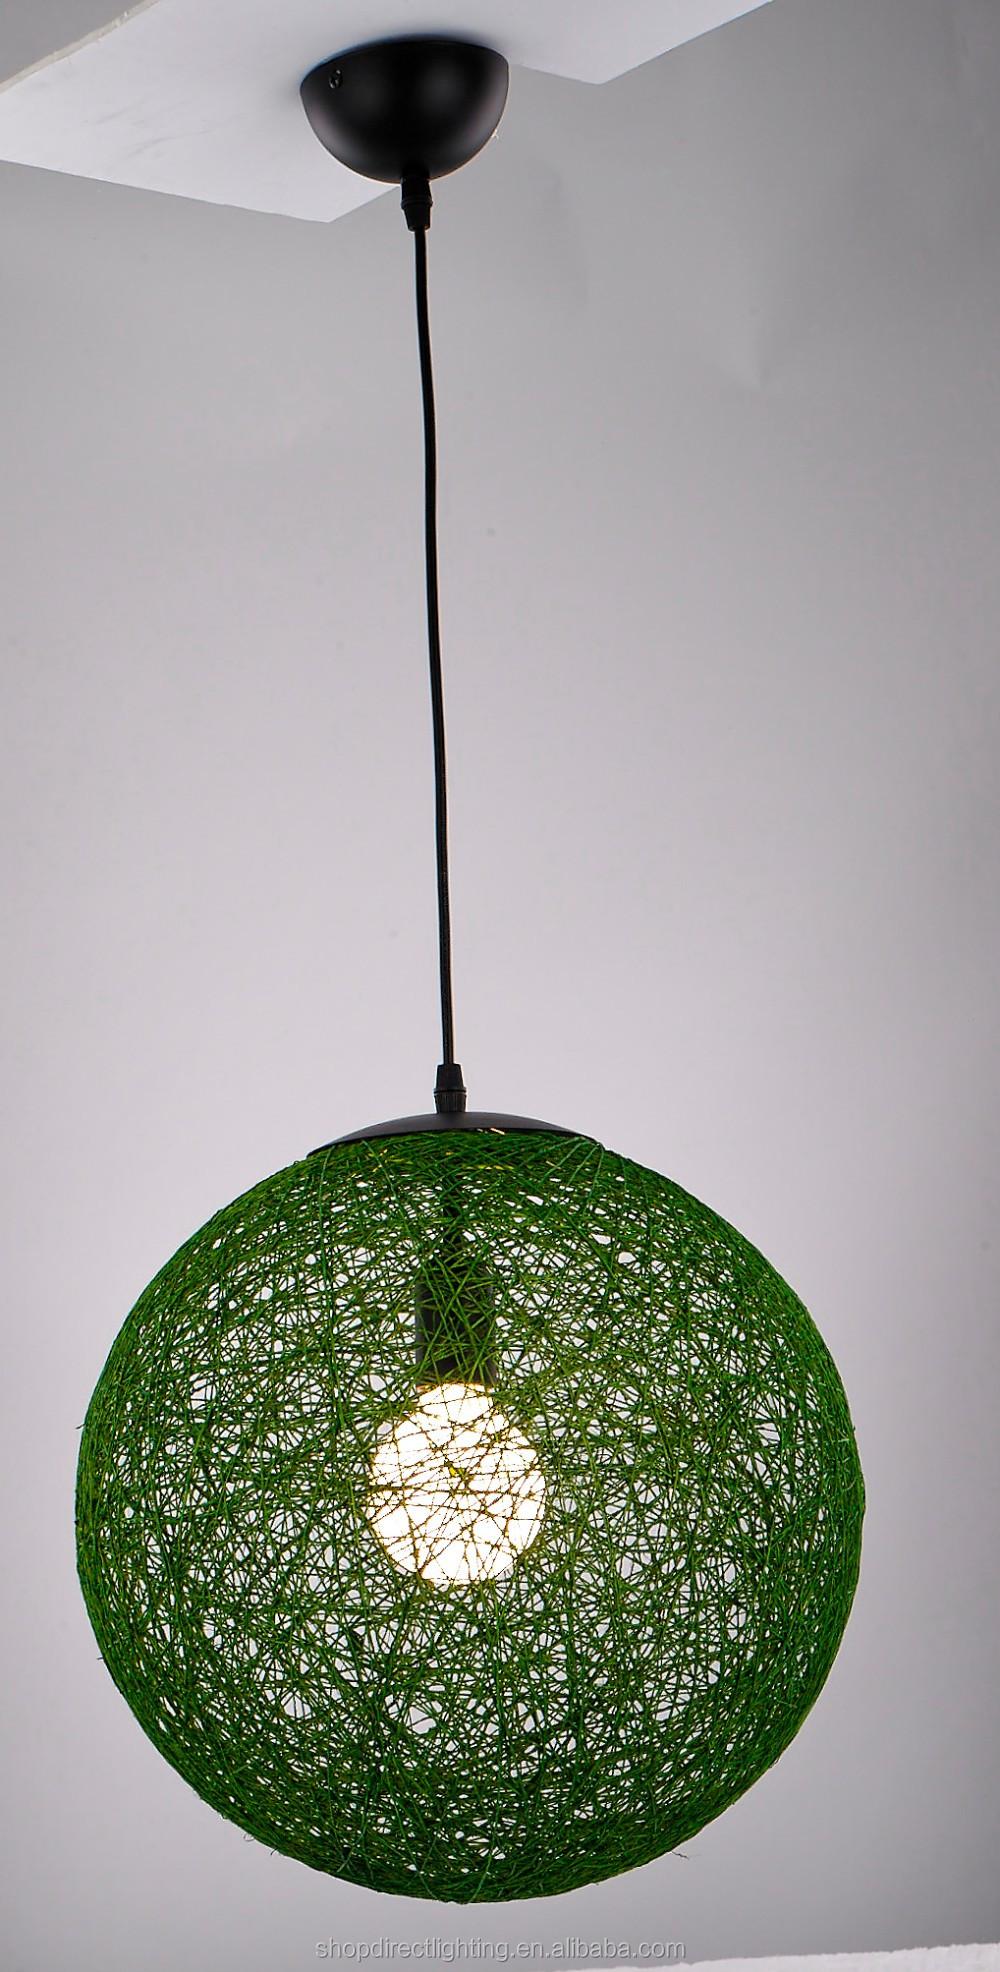 Easy Fit Modern Wicker Rattan Abaca Ball Ceiling Pendant Light ...